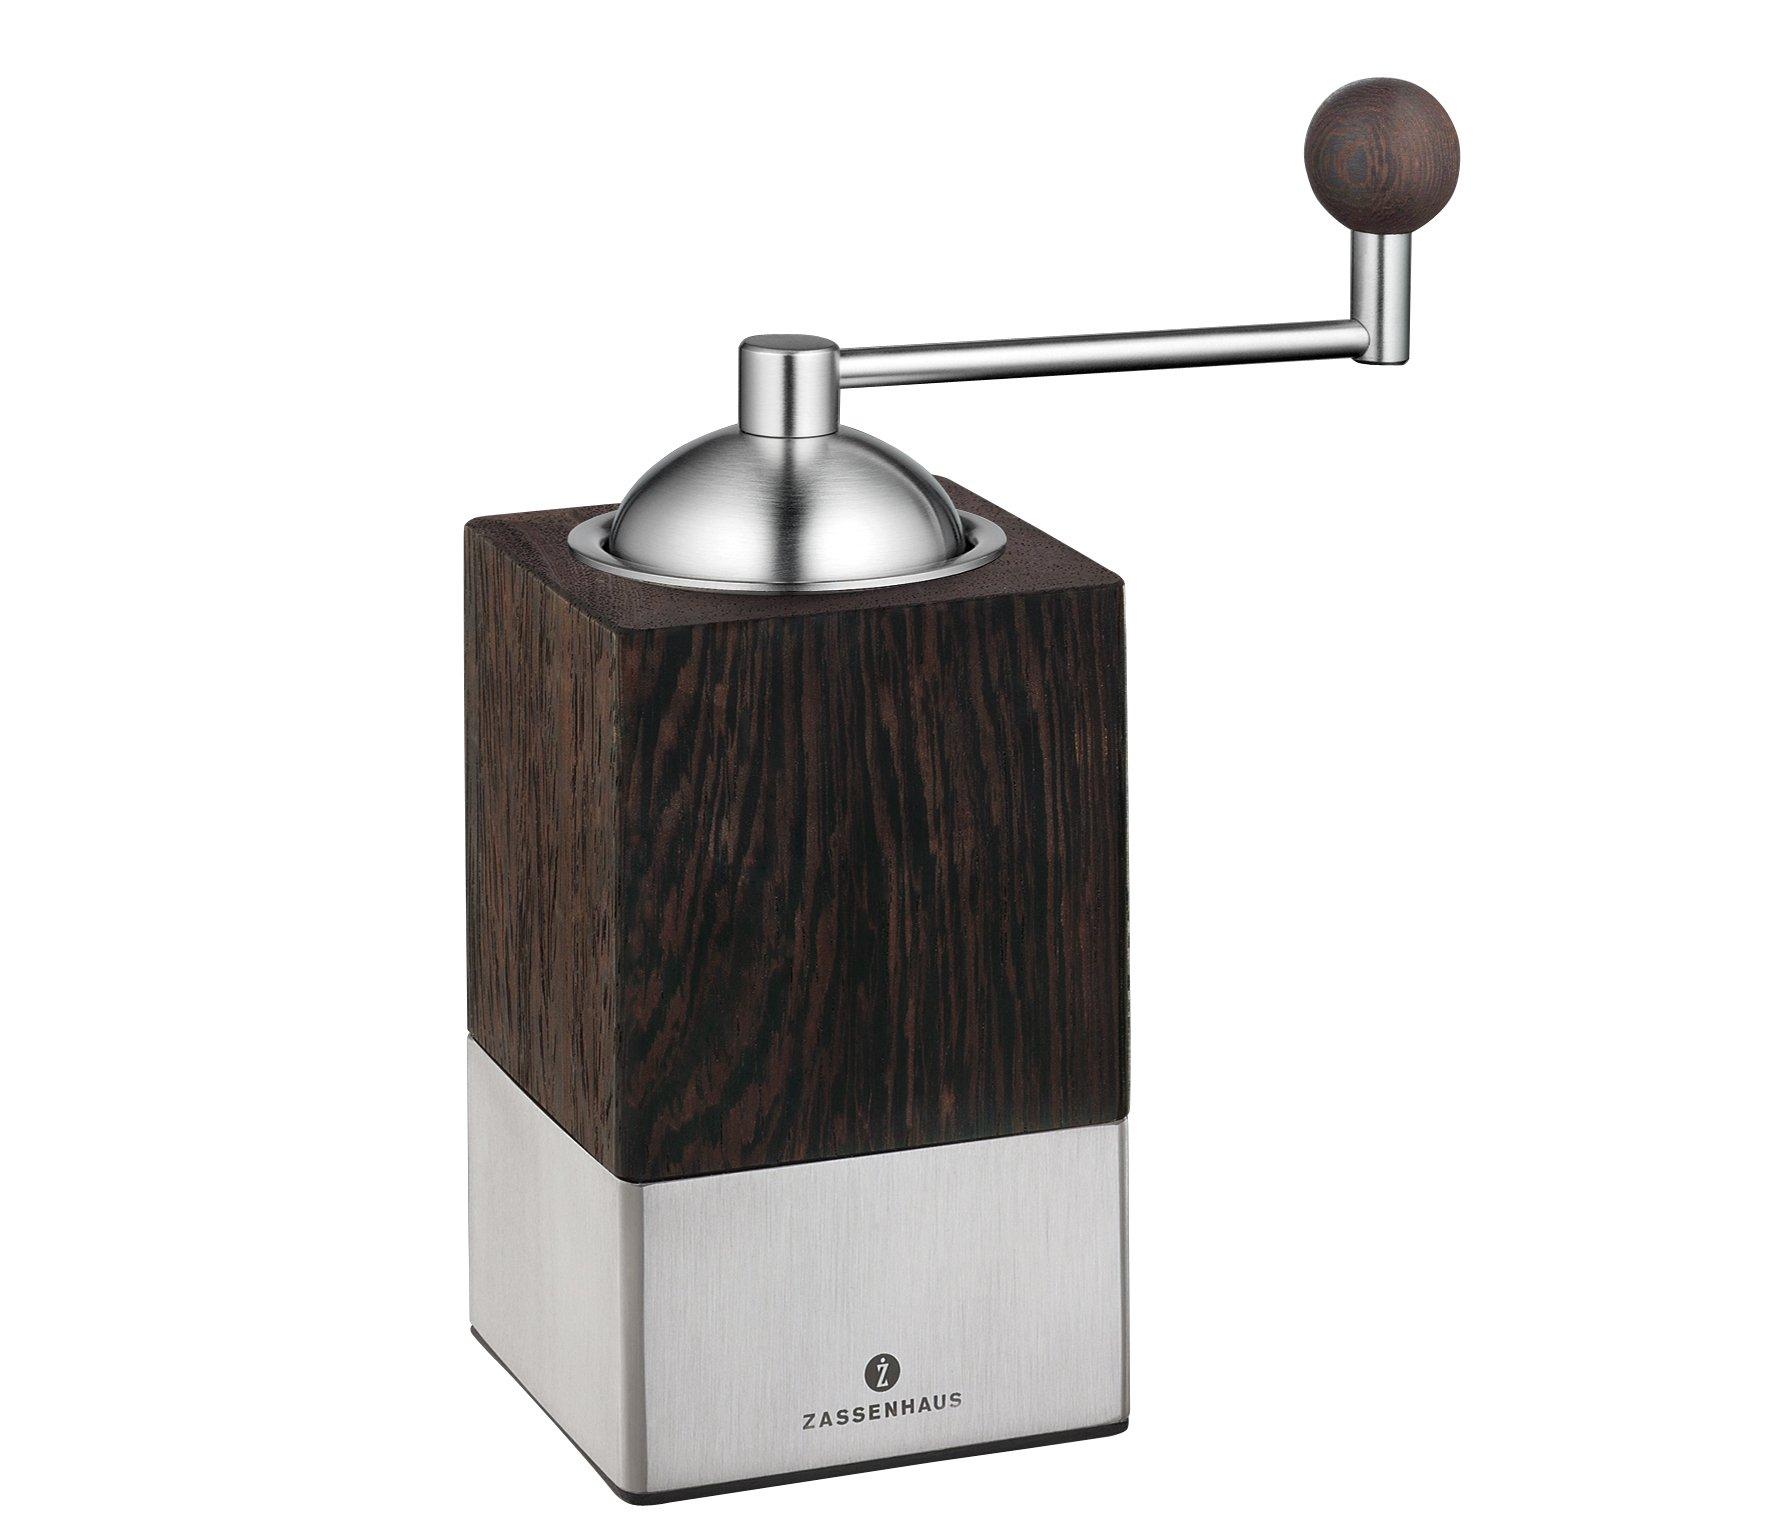 Zassenhaus M041071 Coffee Mill, Black